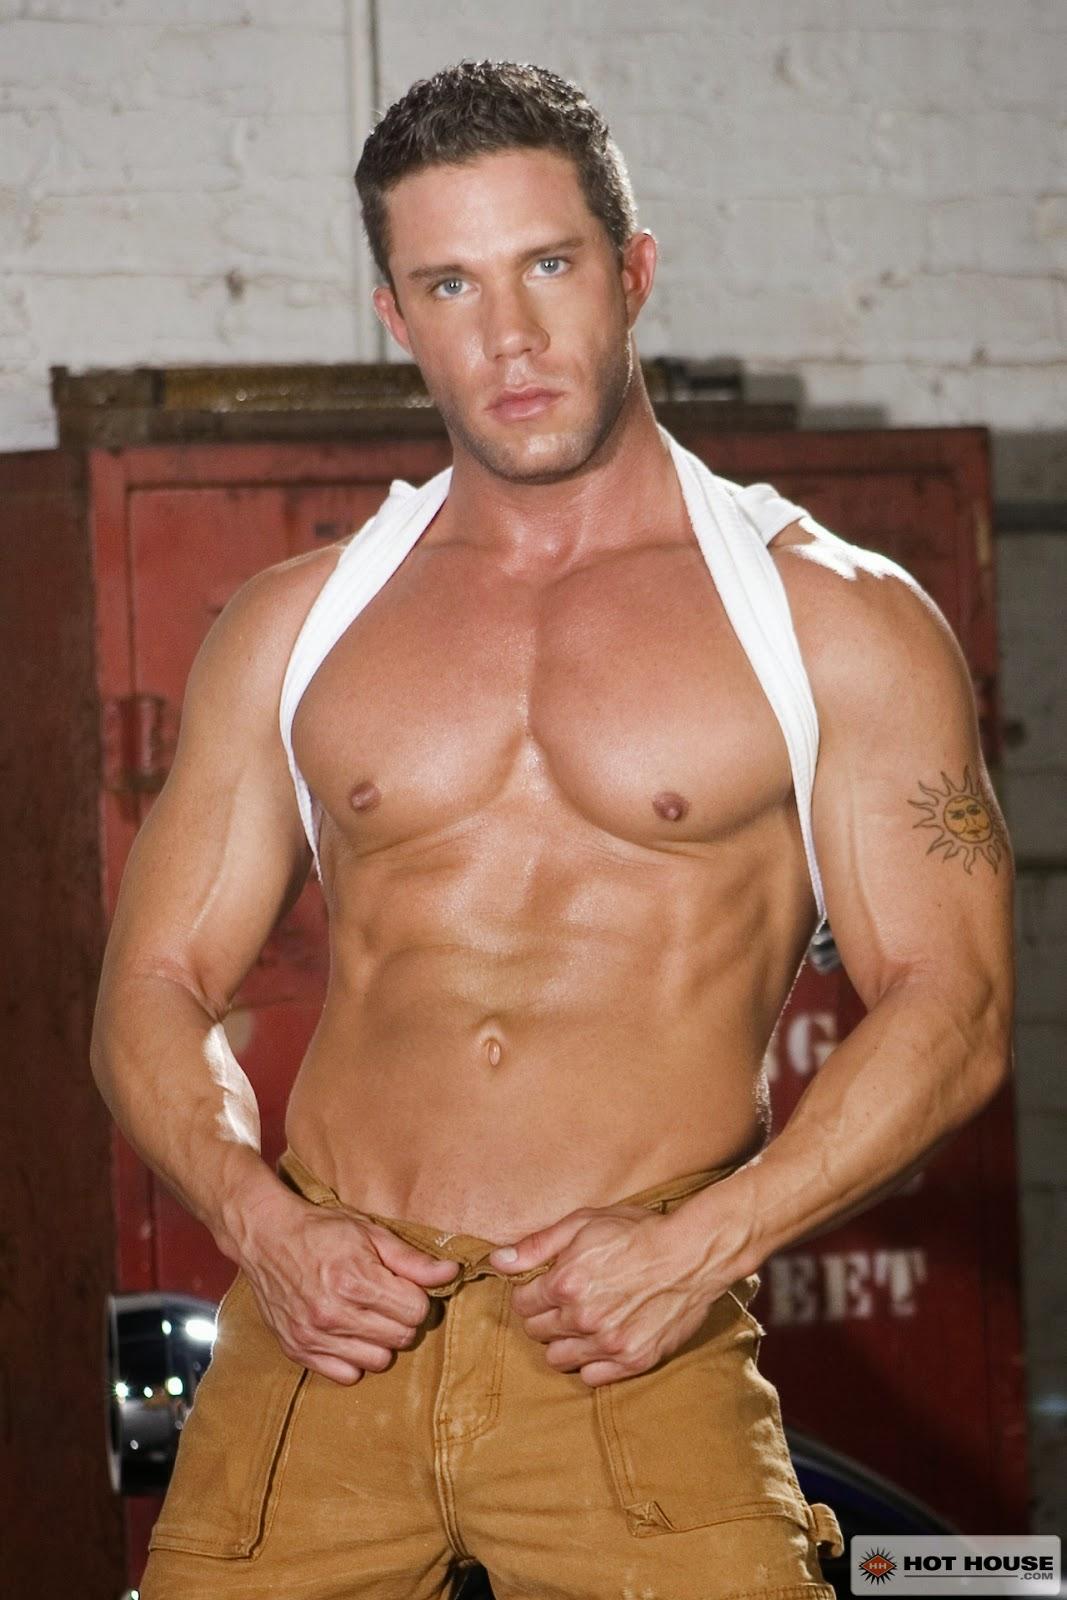 Phil bradley porn star